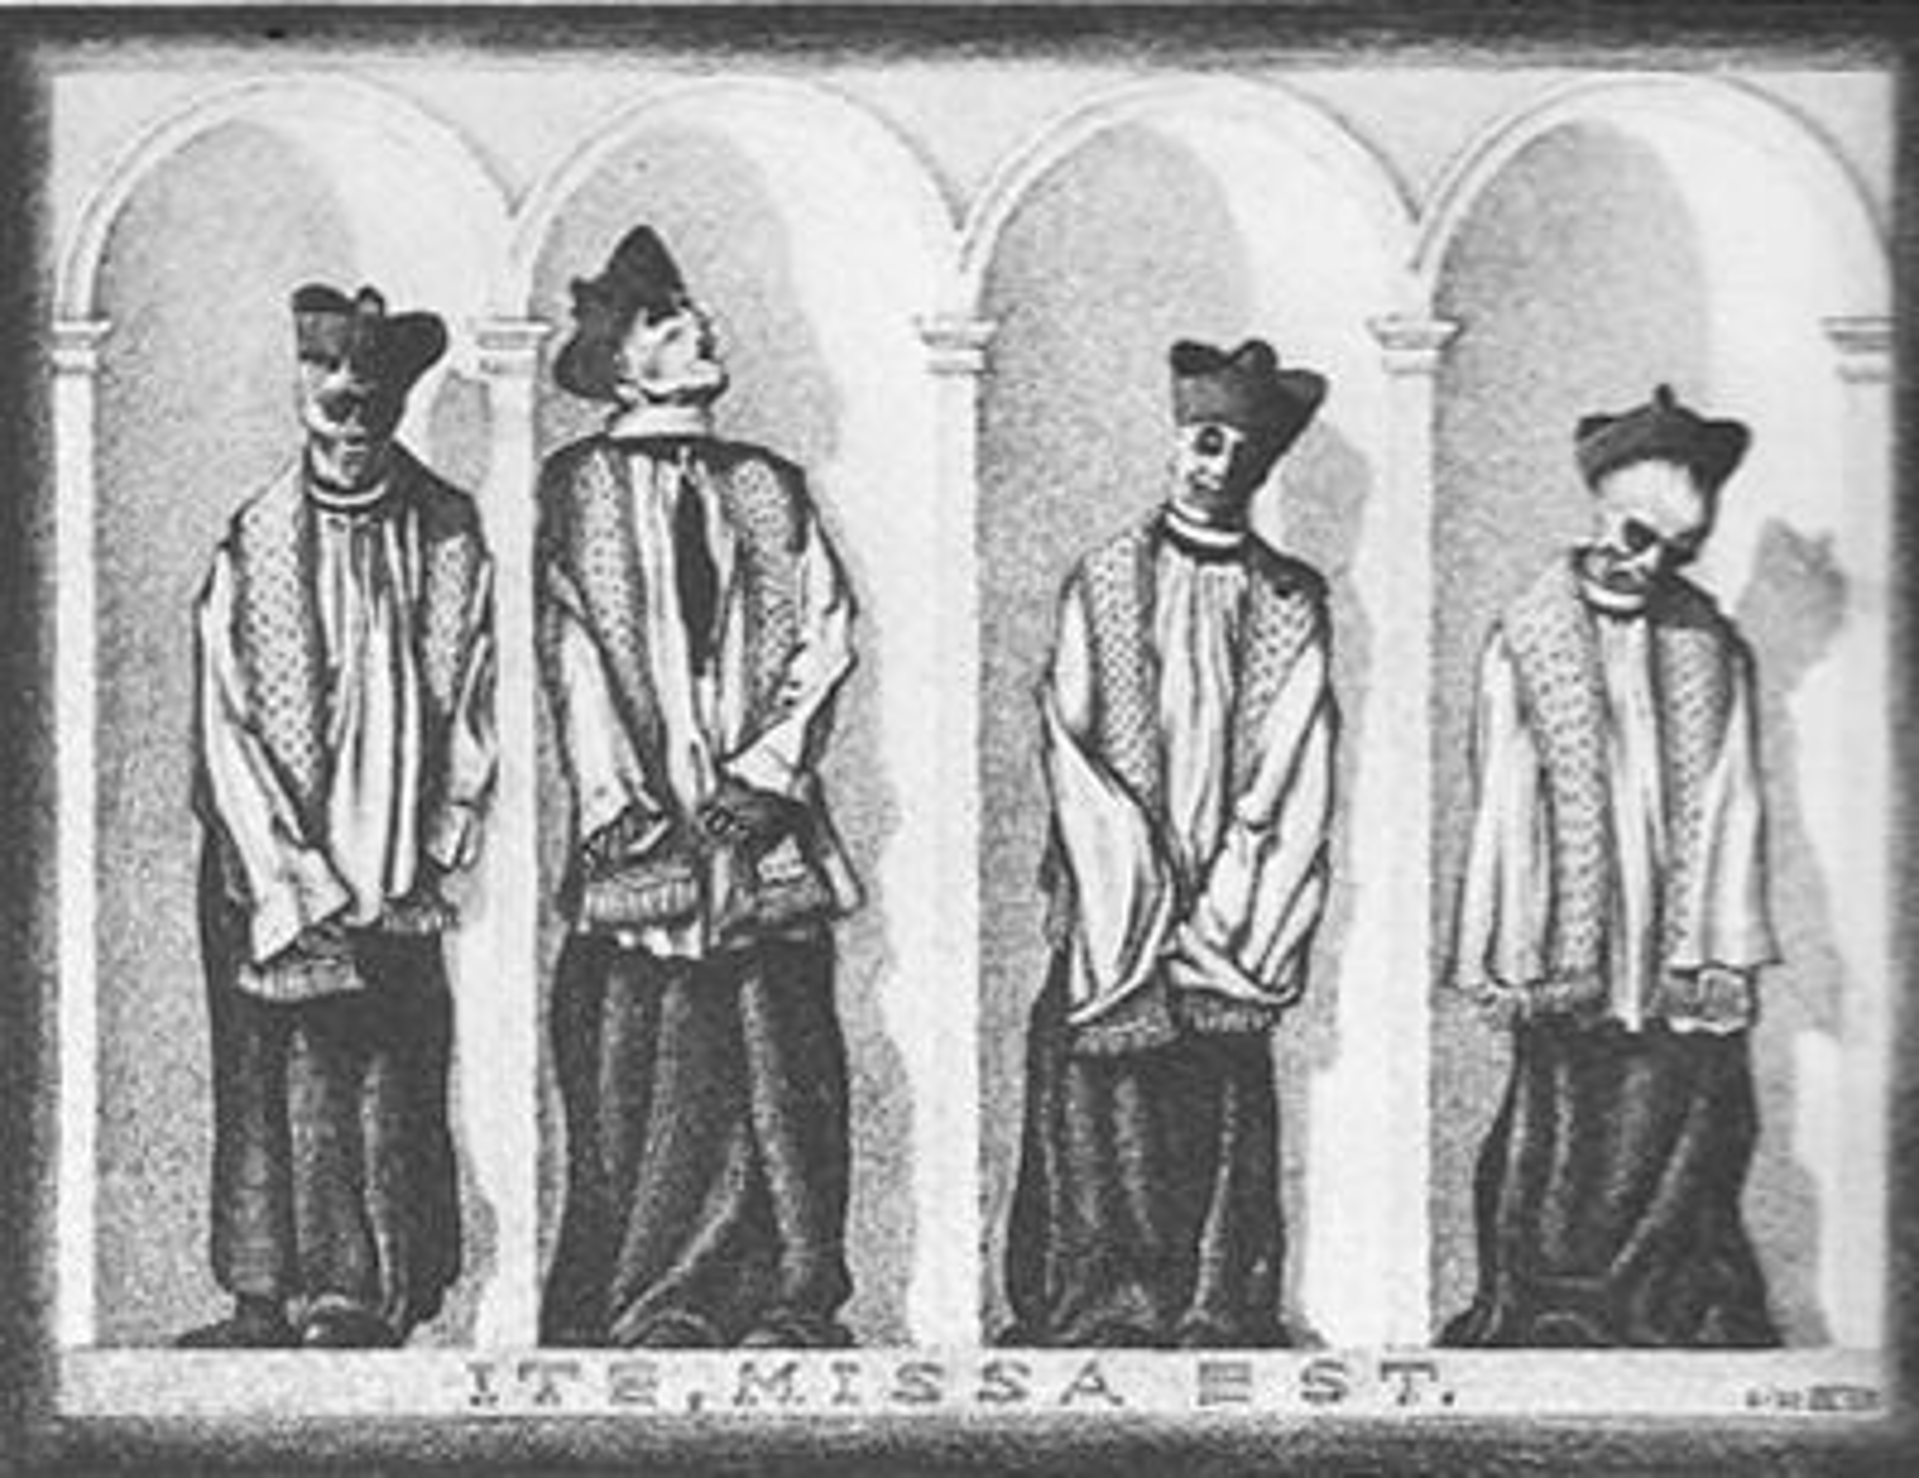 Mummified Priests in Gangi, Sicily by M.C. Escher